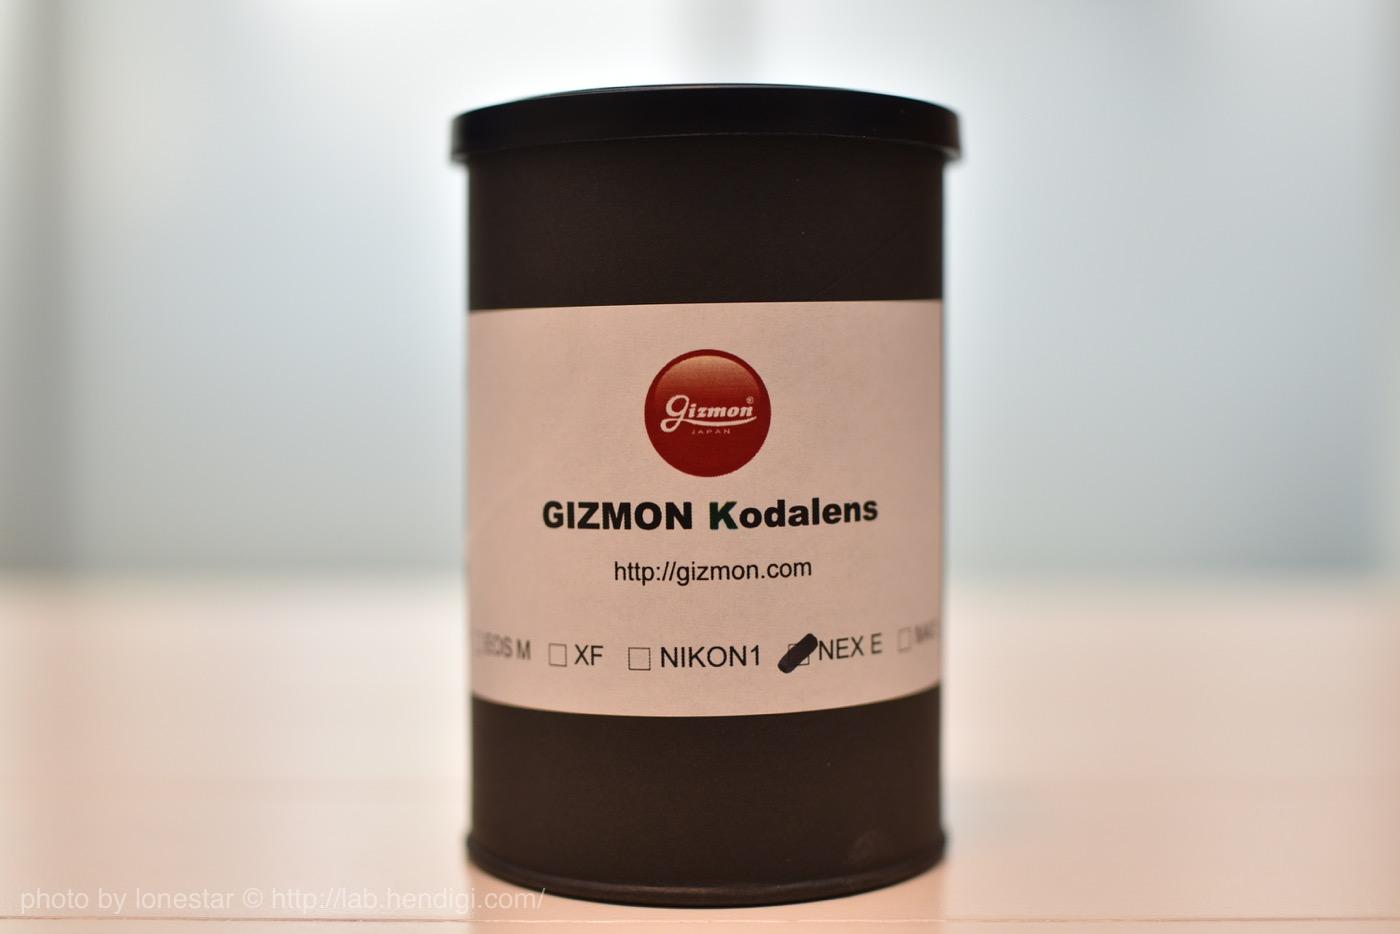 GIZMON Kodalens